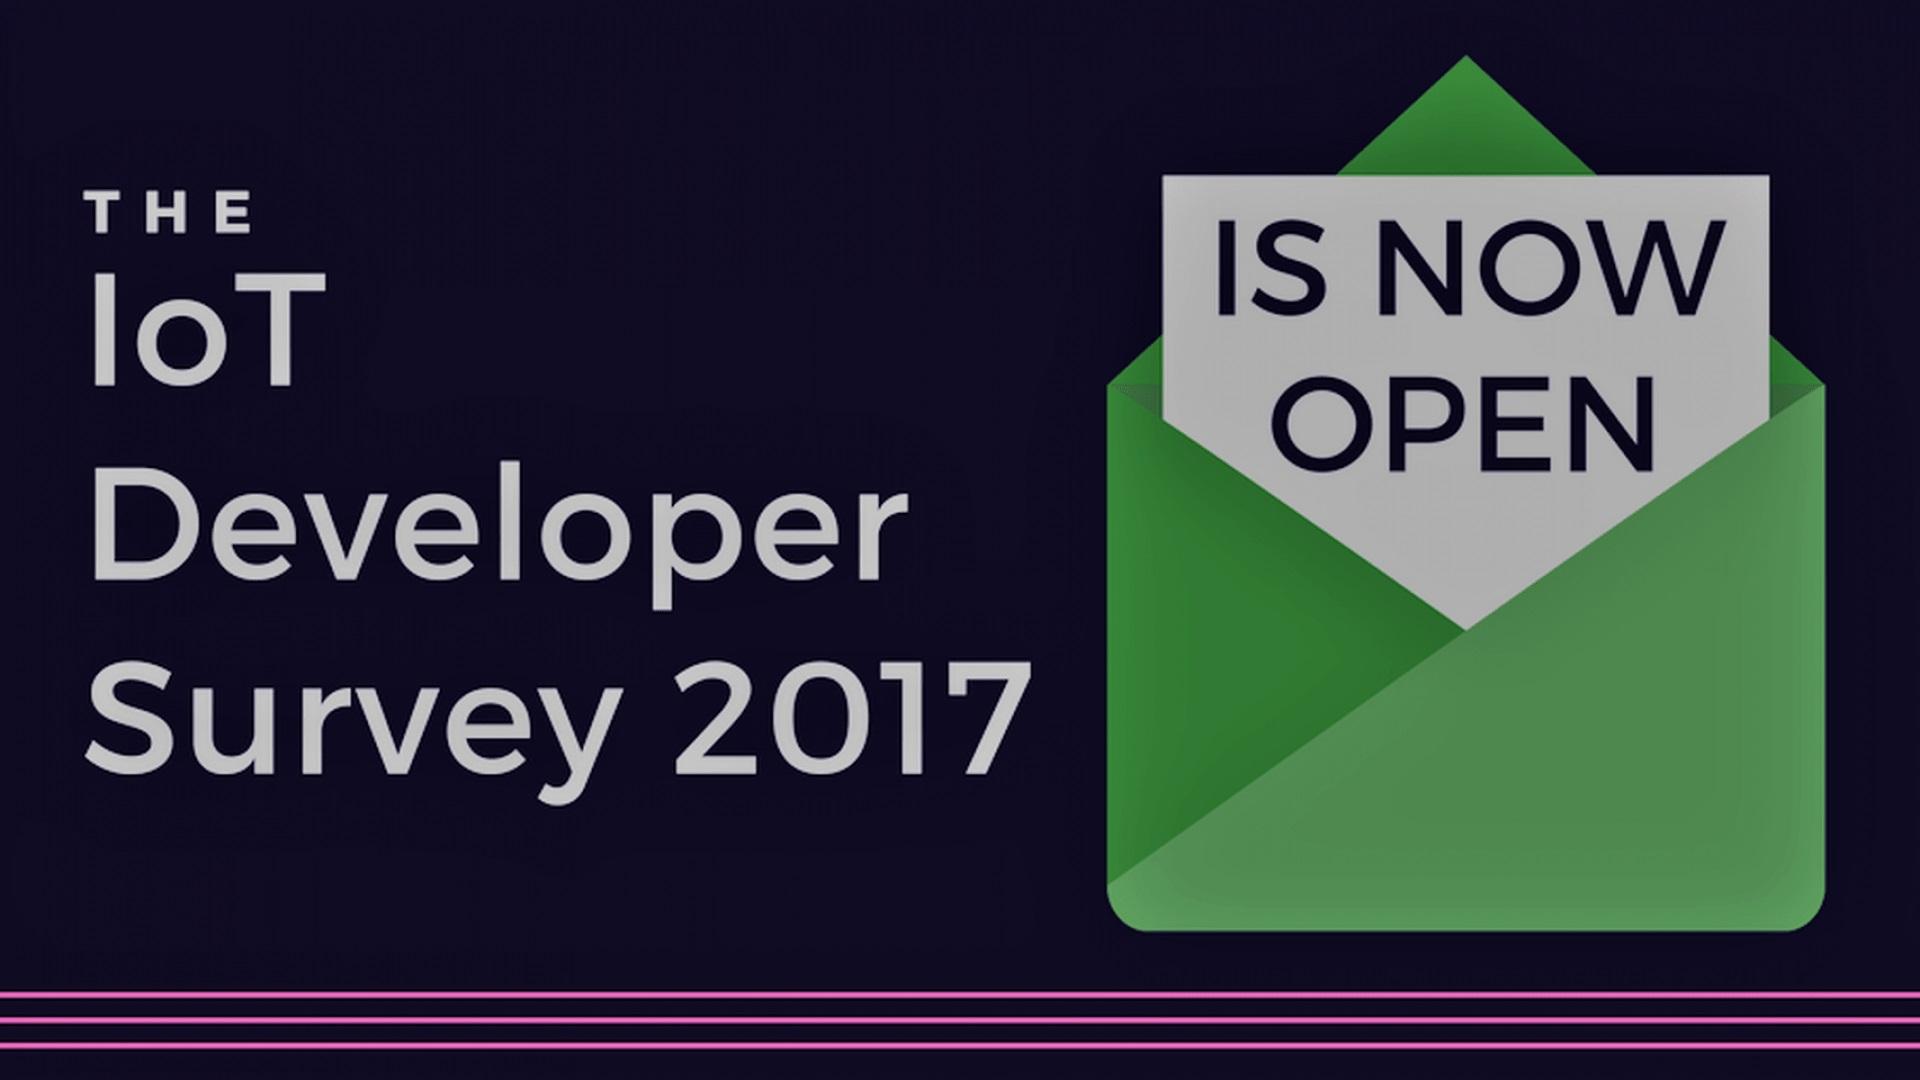 Participate in the IoT Developer Survey 2017!